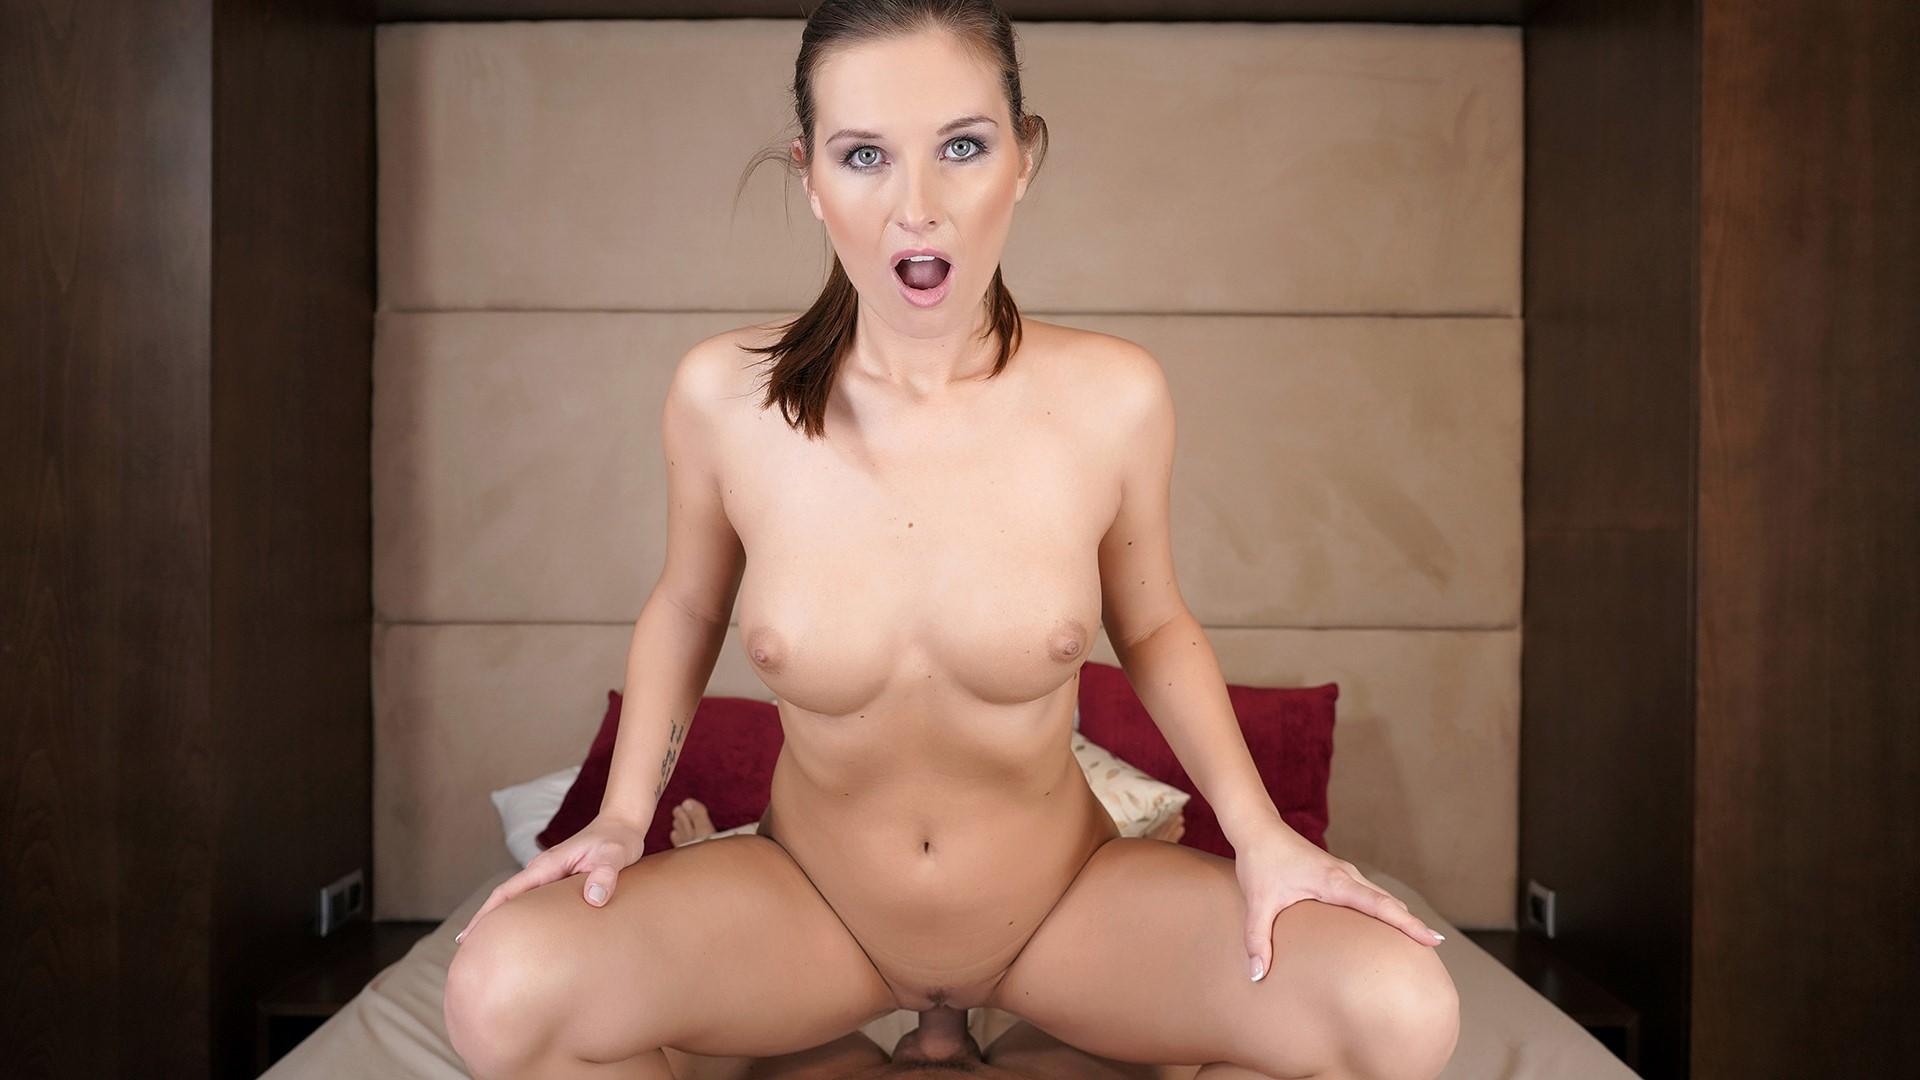 A Sensual Touch - Curvy Goddess